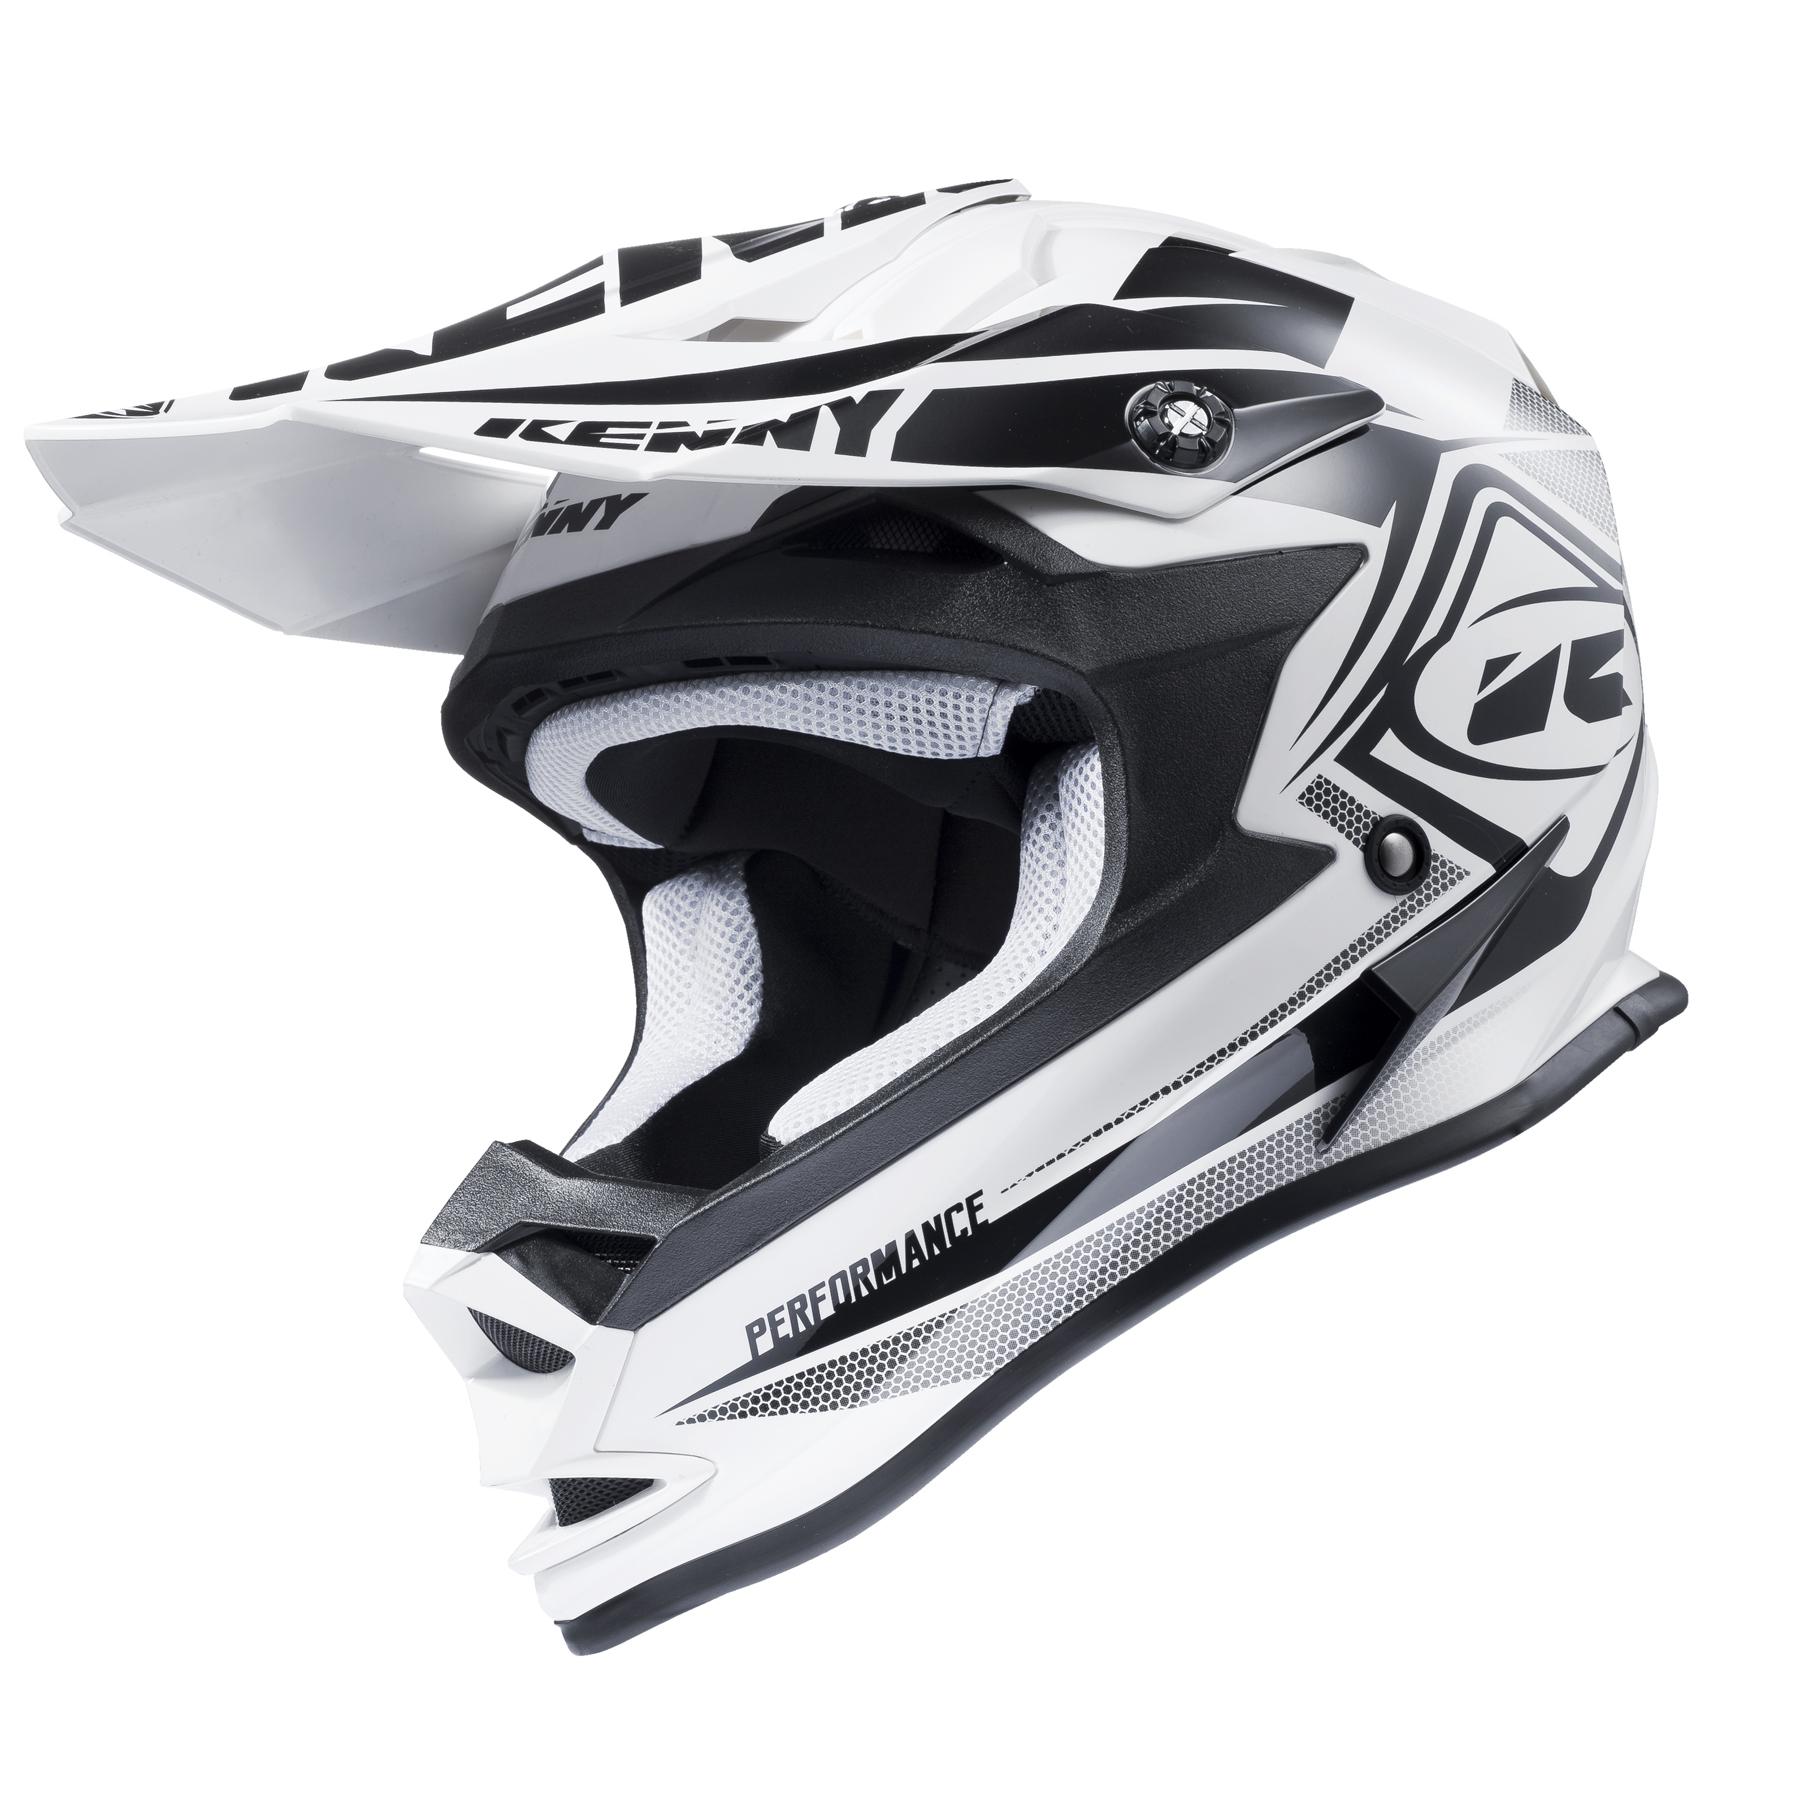 kenny performance 2017 helmet white black xl motodeluxe. Black Bedroom Furniture Sets. Home Design Ideas